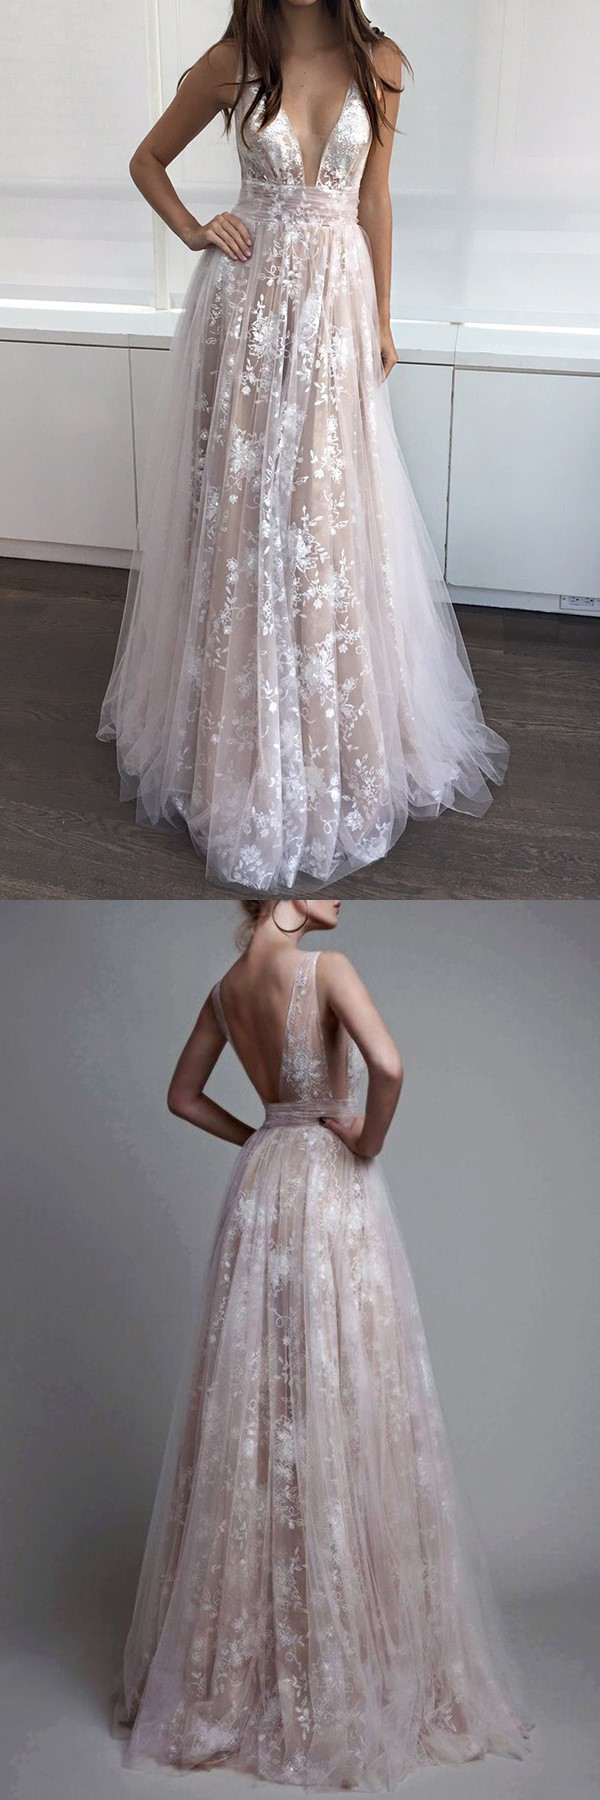 prom dress long prom dress elegant long prom dress formal